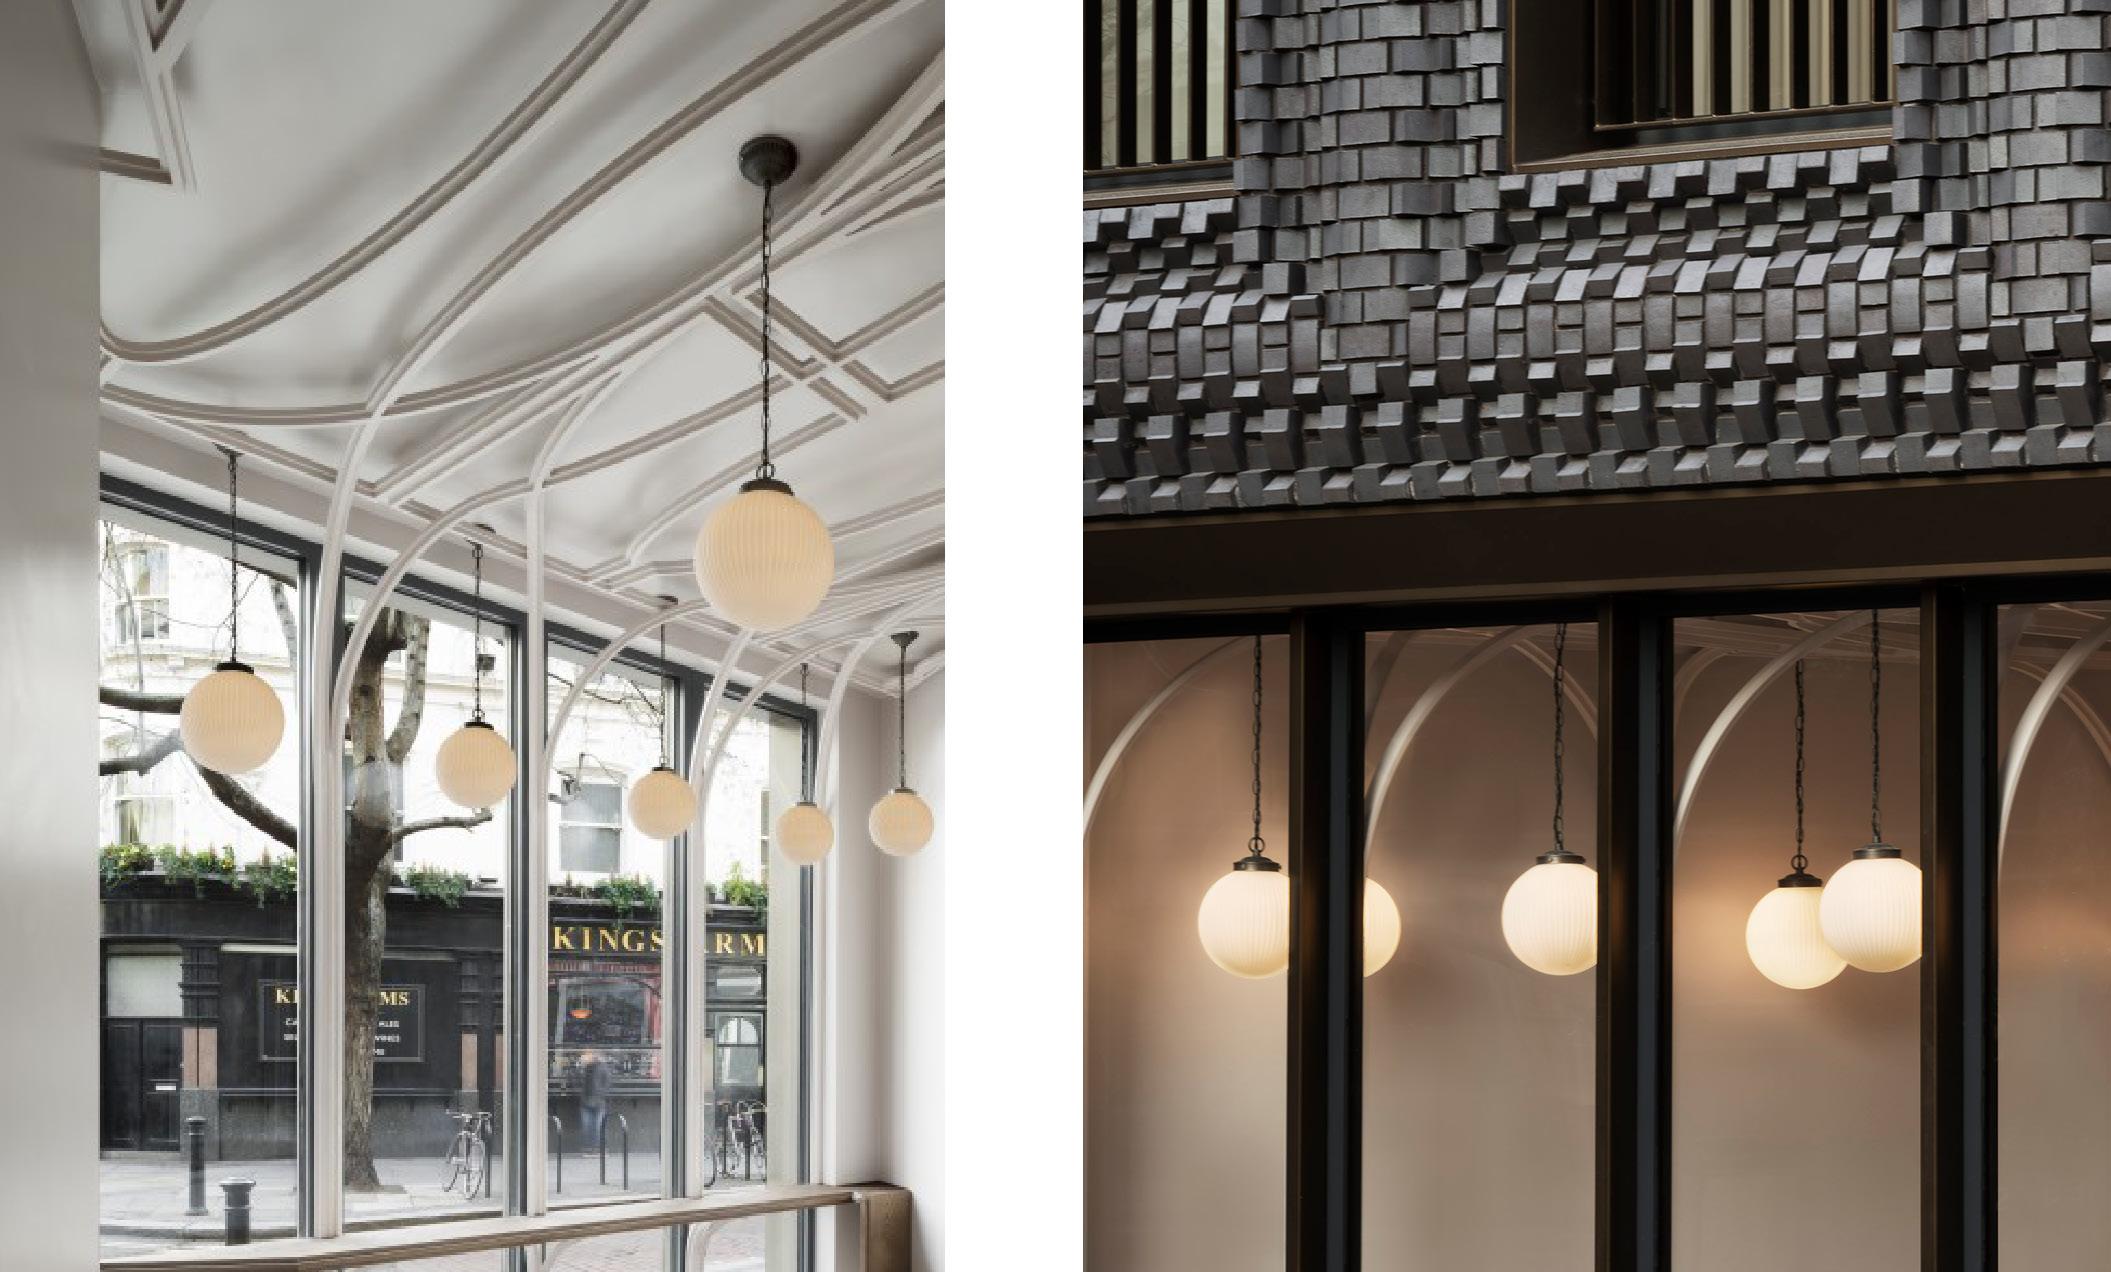 The interlock hgg london - Bureau de change a strasbourg ...